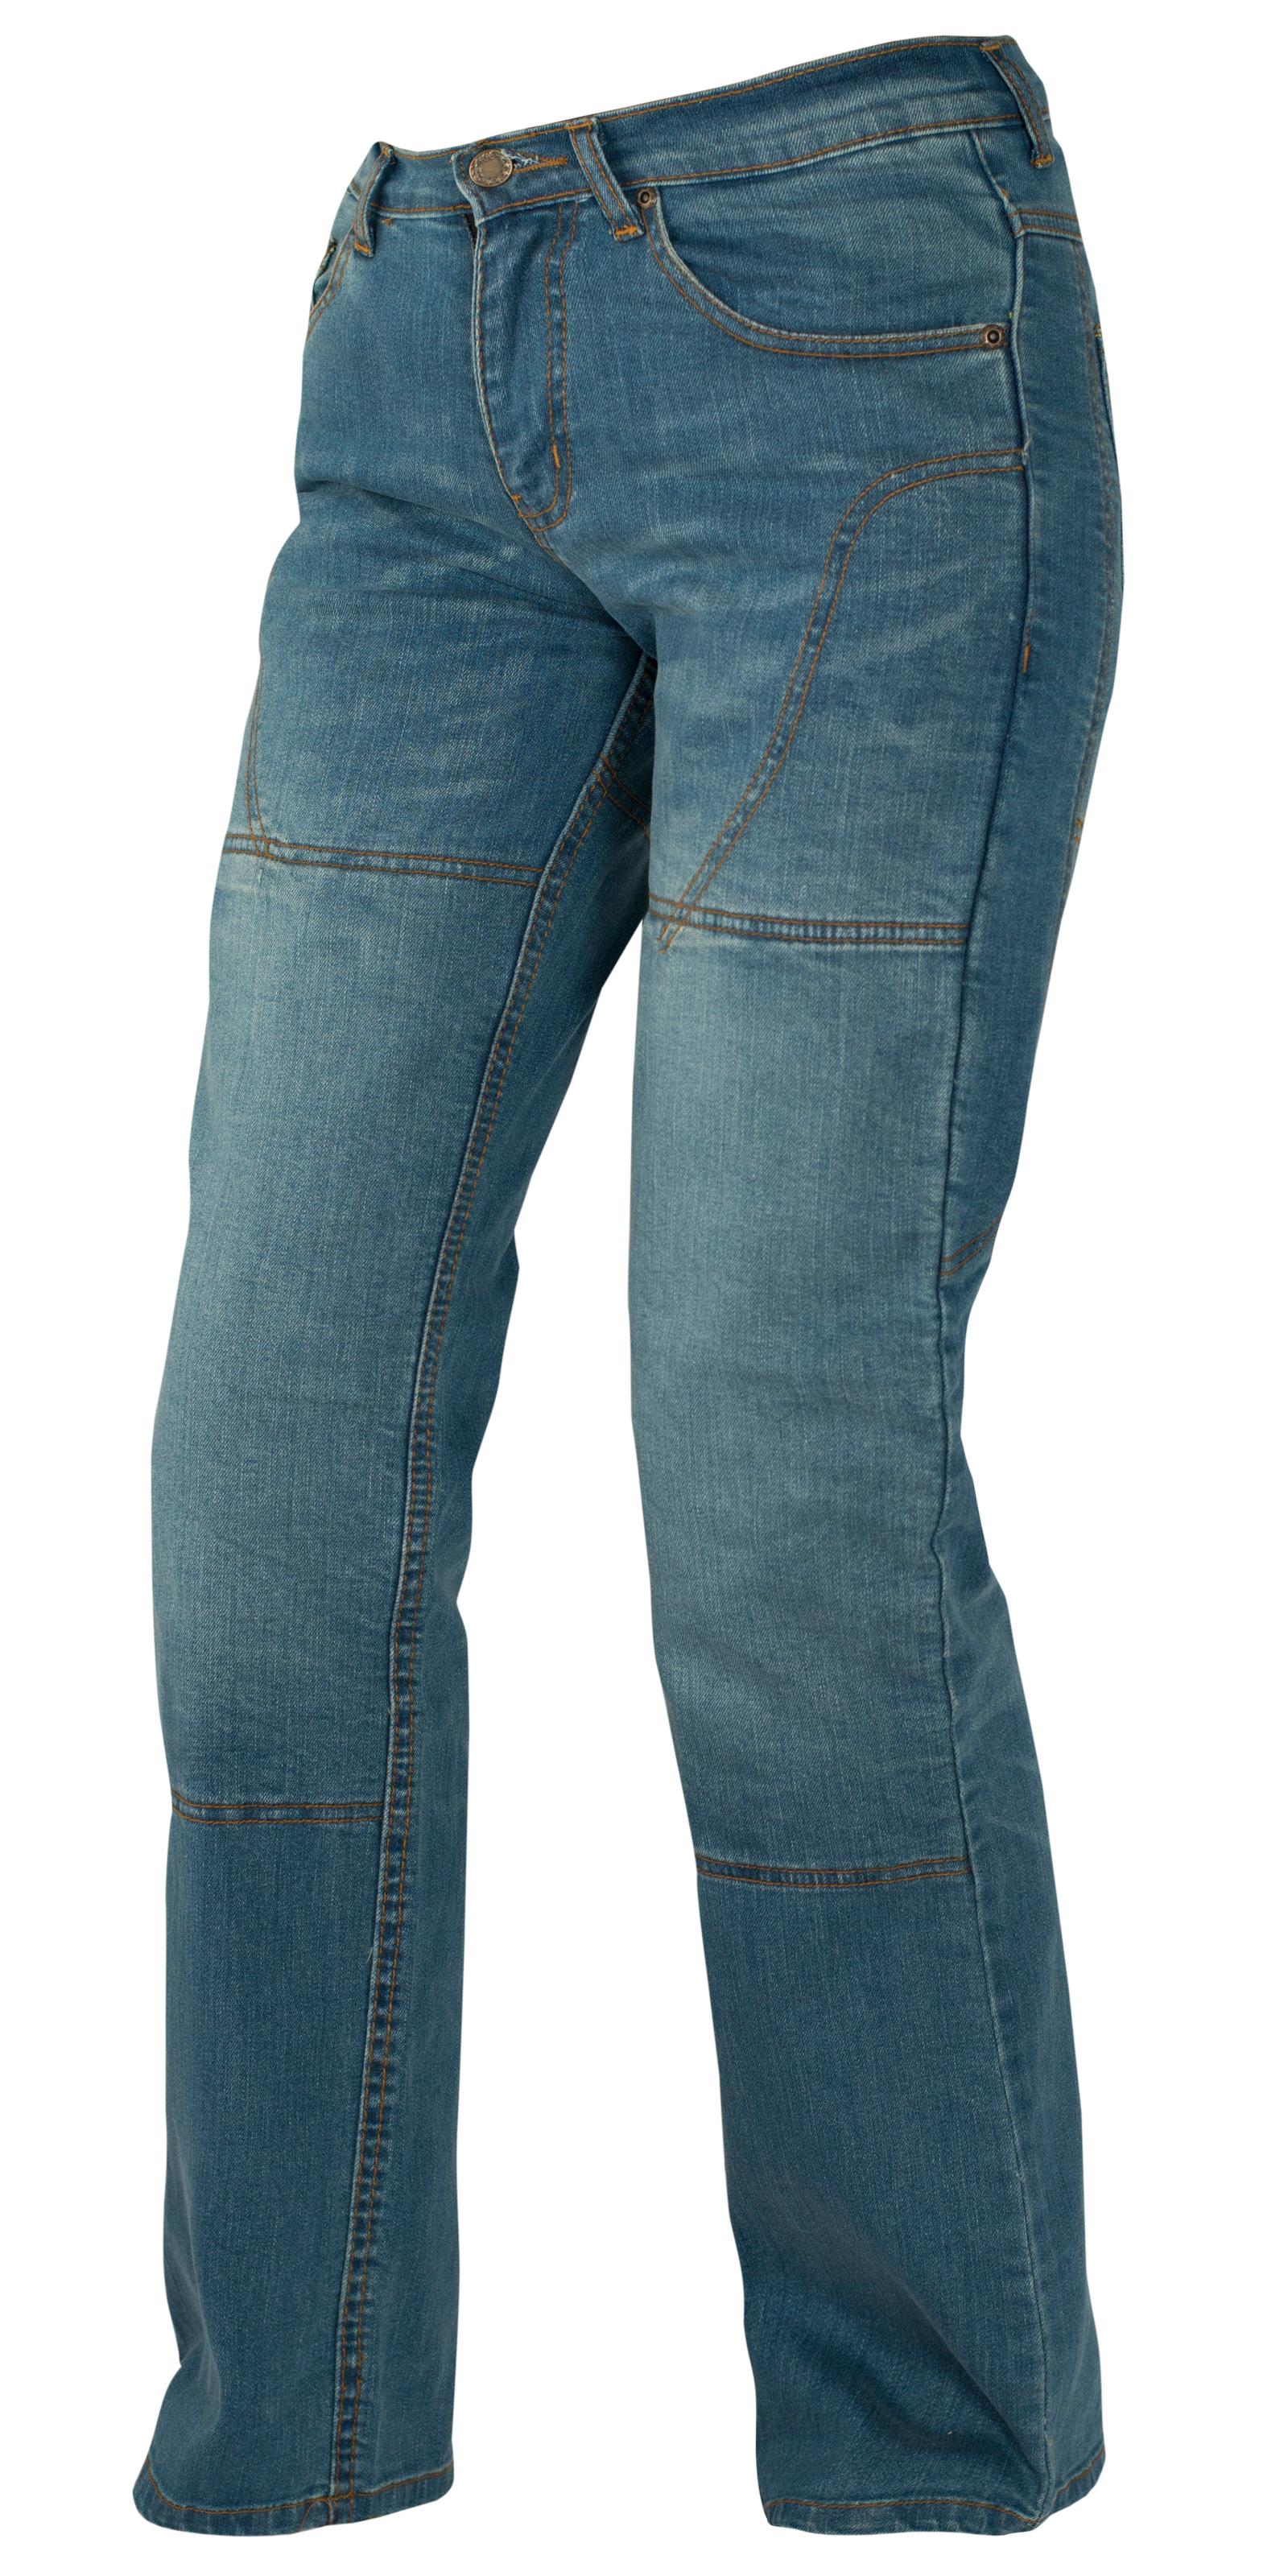 Pantalon-Femme-Jeans-Moto-Protections-Homologees-Renforts-Bleu miniature 6